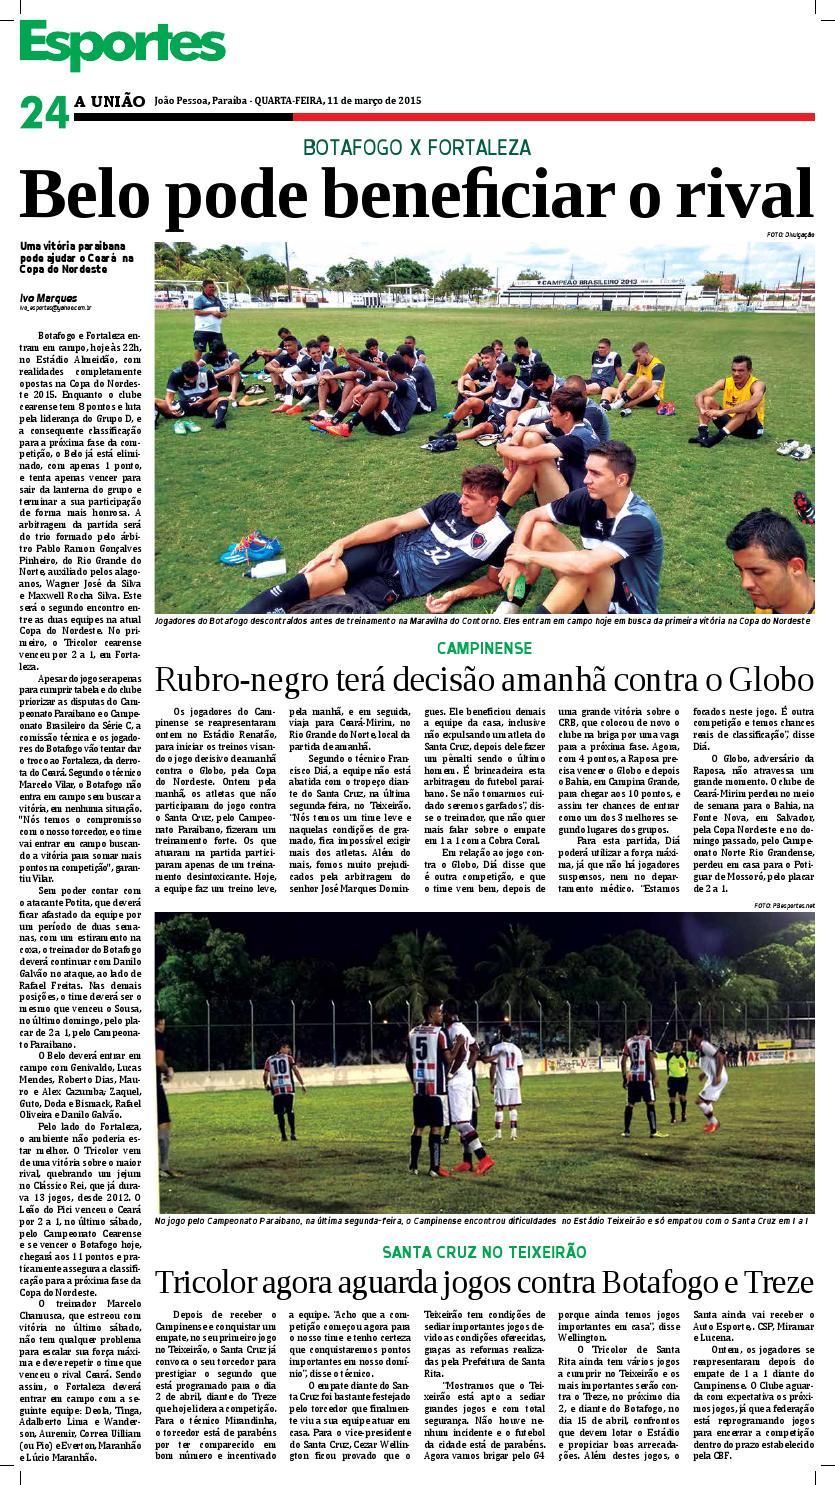 5c7a6bda5 Jornal A União by Jornal A União - issuu